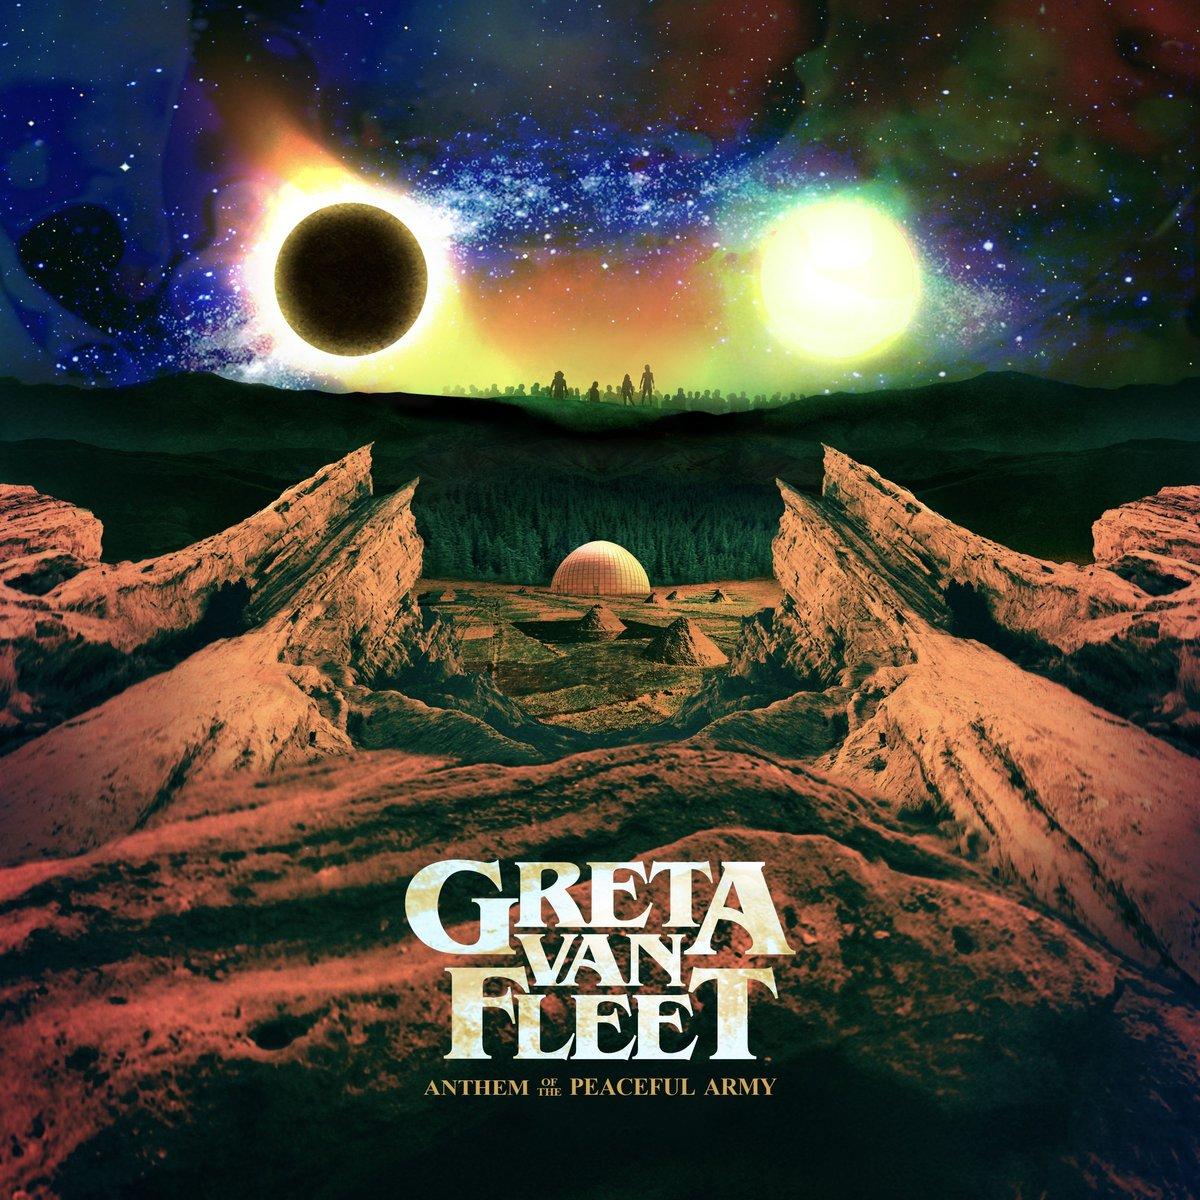 Greta Van Fleet – Anthem Of The Peacefull Army